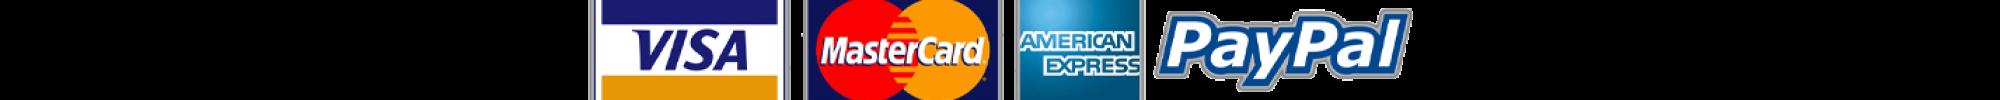 logo-credit-card-payment-card-american-express-credit-card-3ccc9605cfe5c4f09564806ff1995ebd-1